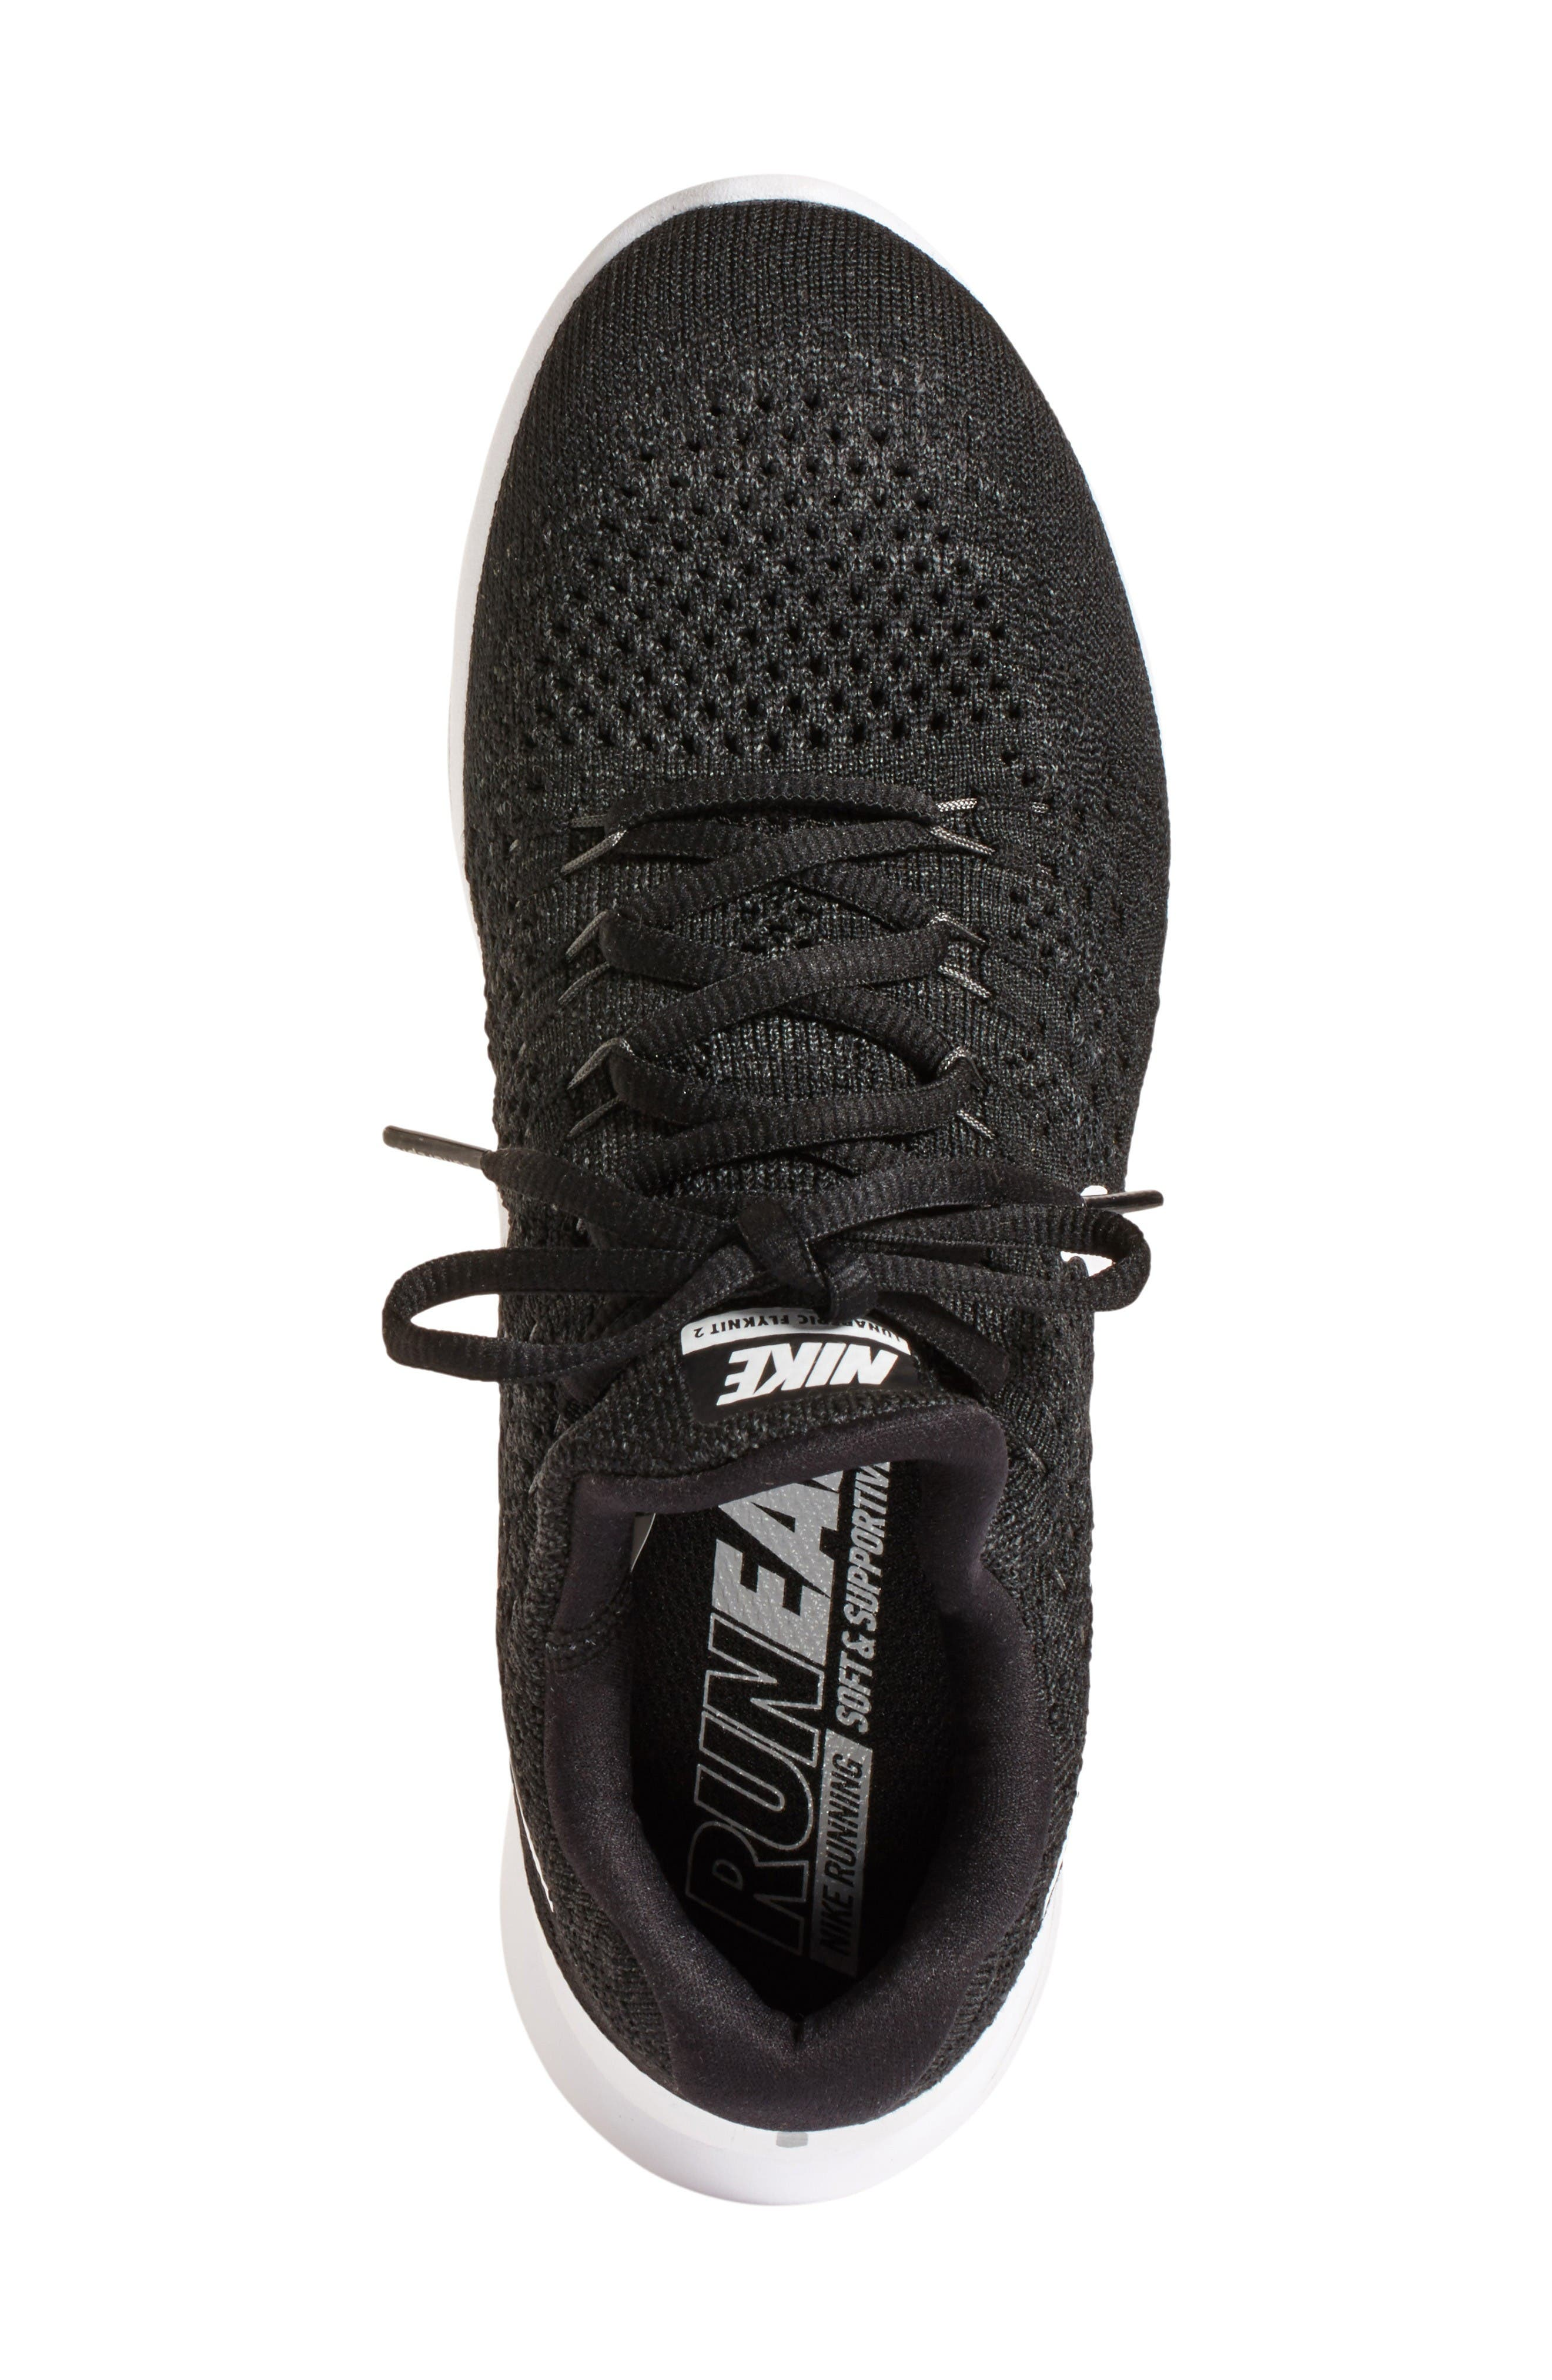 Flyknit 2 LunarEpic Running Shoe,                             Alternate thumbnail 3, color,                             Black/ White/ Anthracite